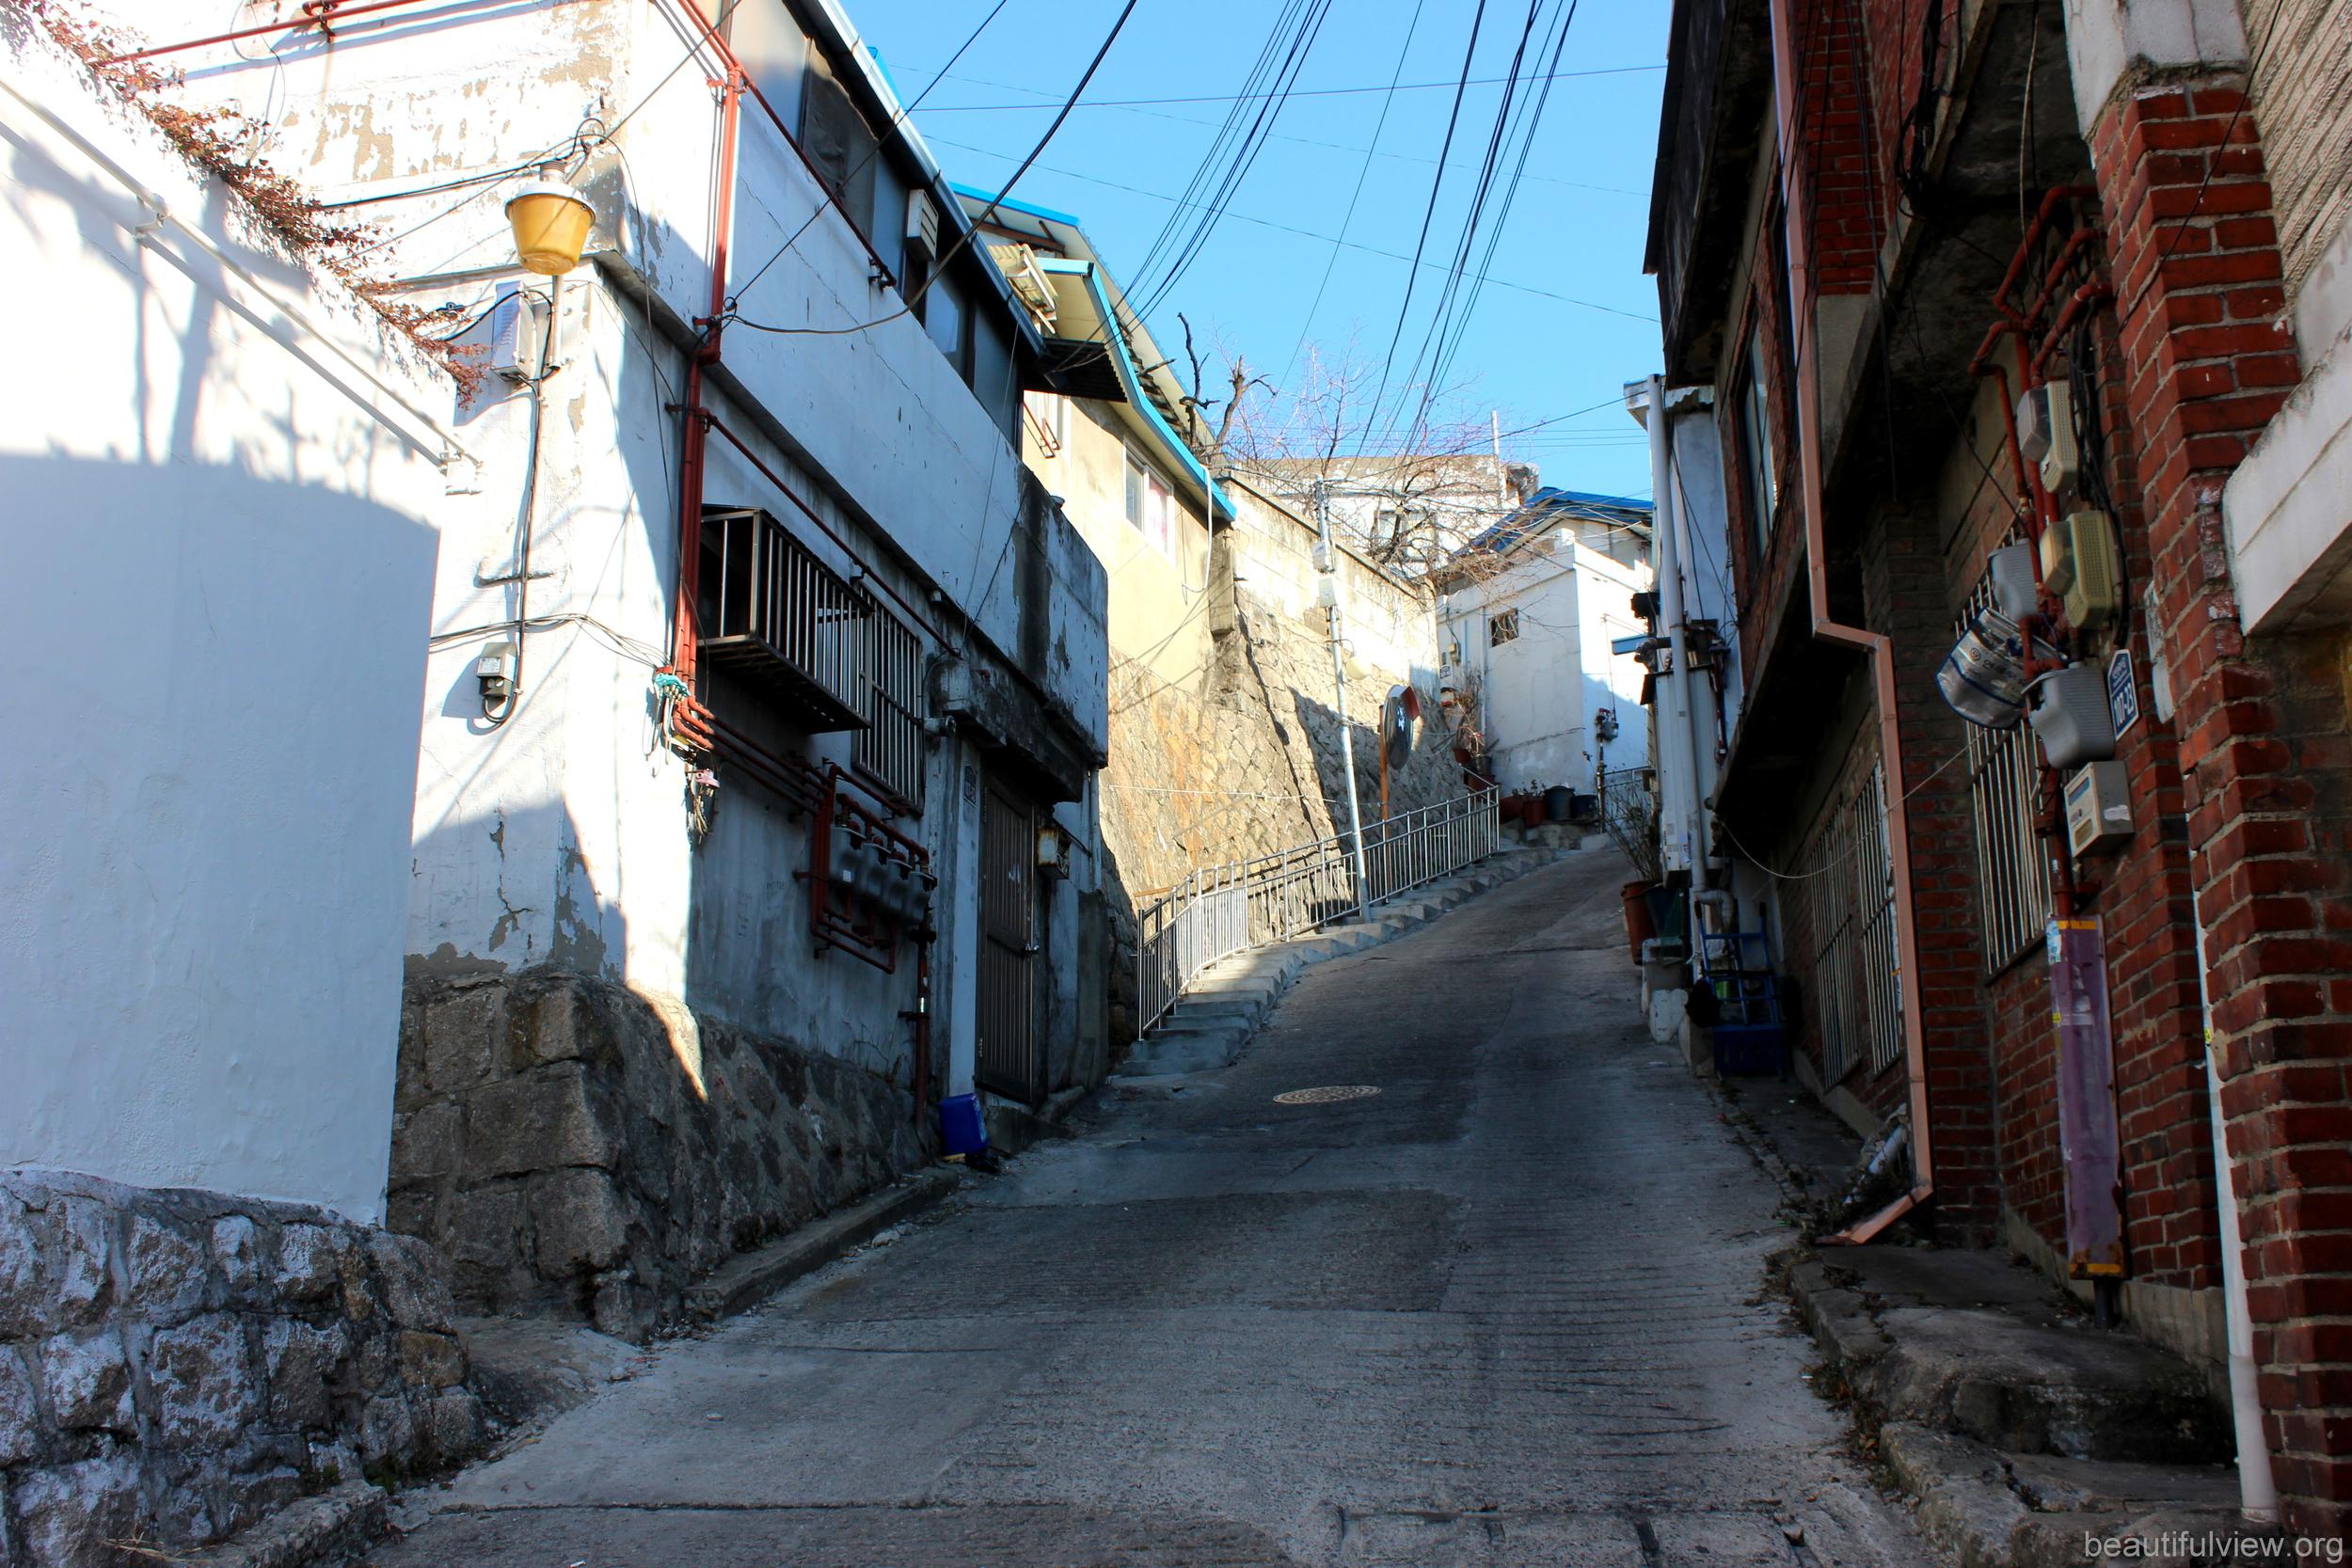 Dem steep hills :O